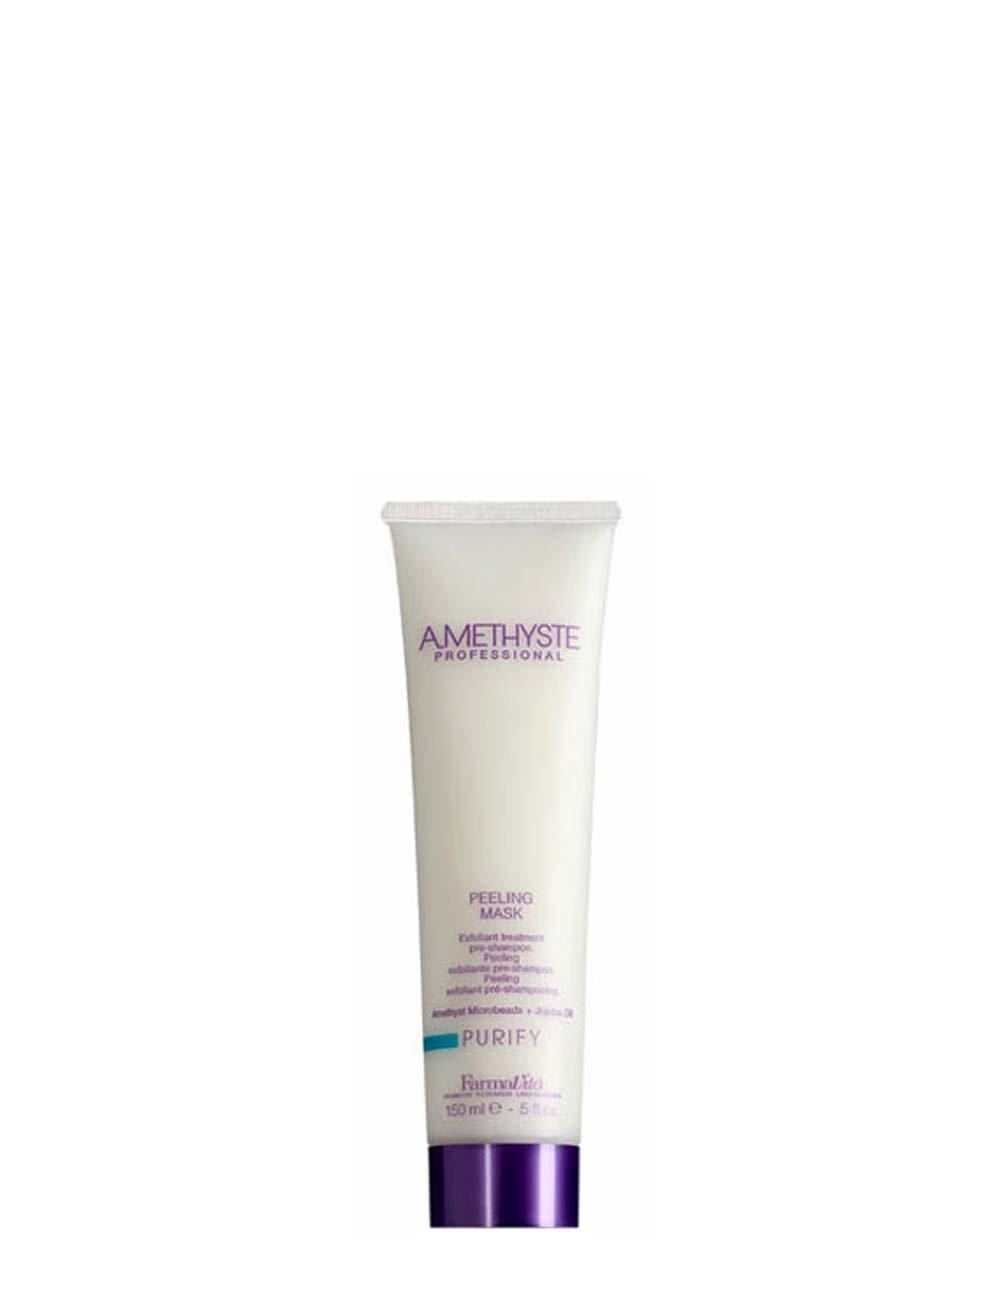 Amethyst Purify Peeling Mask 200 ml Maschera Purificante Pre-Shampoo Capelli Farmavita 8022033016157